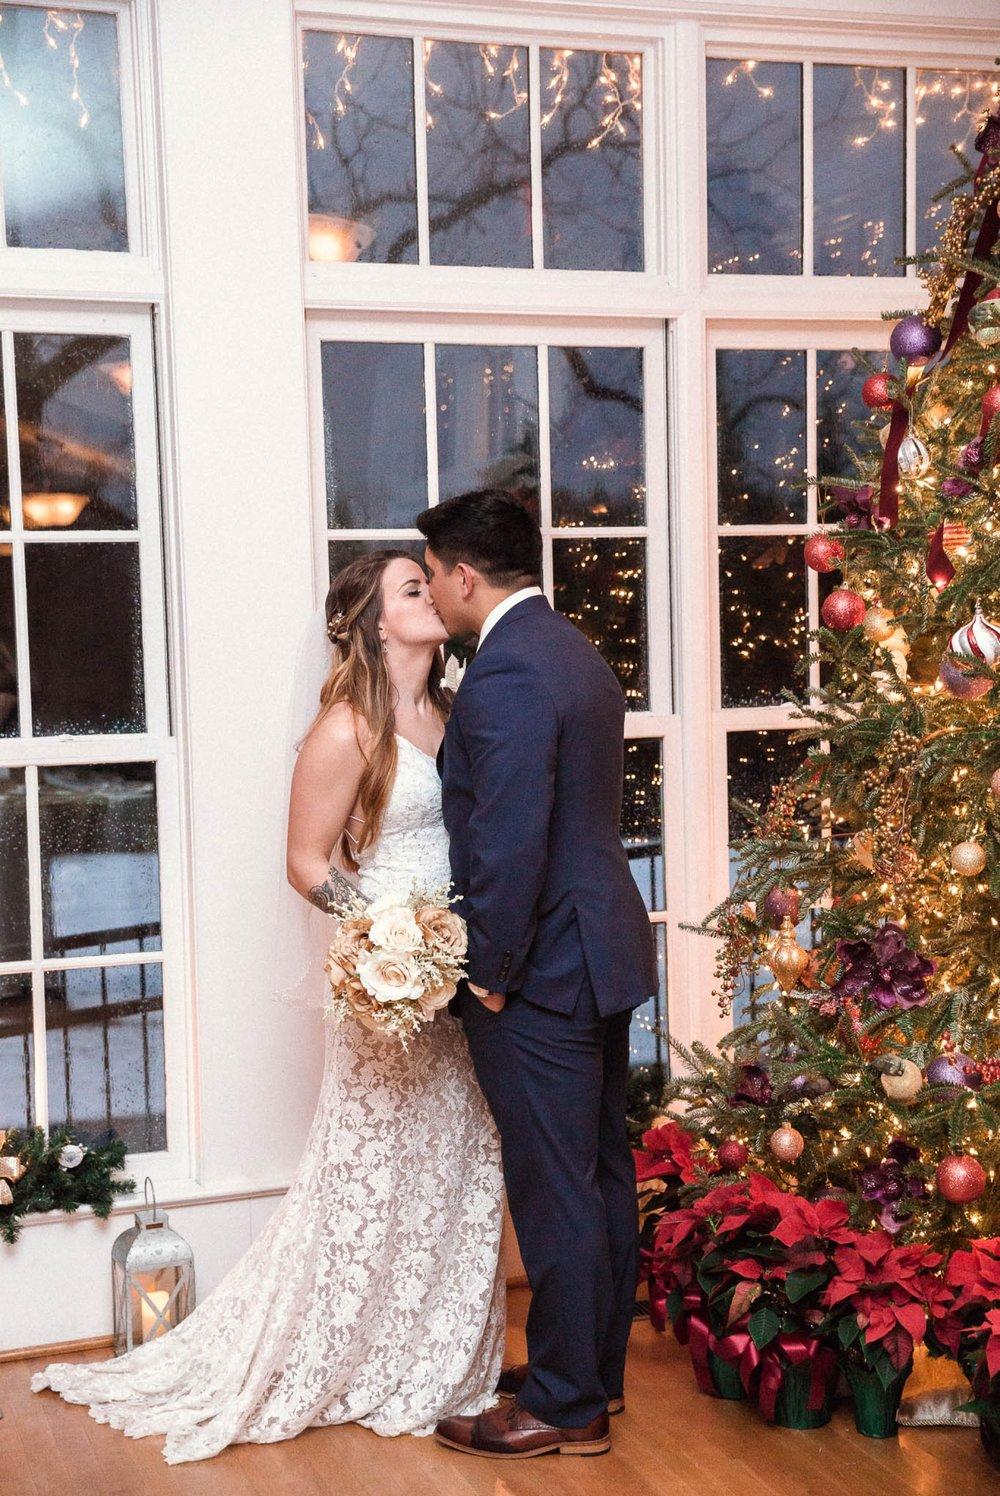 Jessica + Brandon - Christmas Snowy Winter Wedding at the Rand Bryan House in Garner, NC - Raleigh North Carolina Wedding Photographer 27.jpg